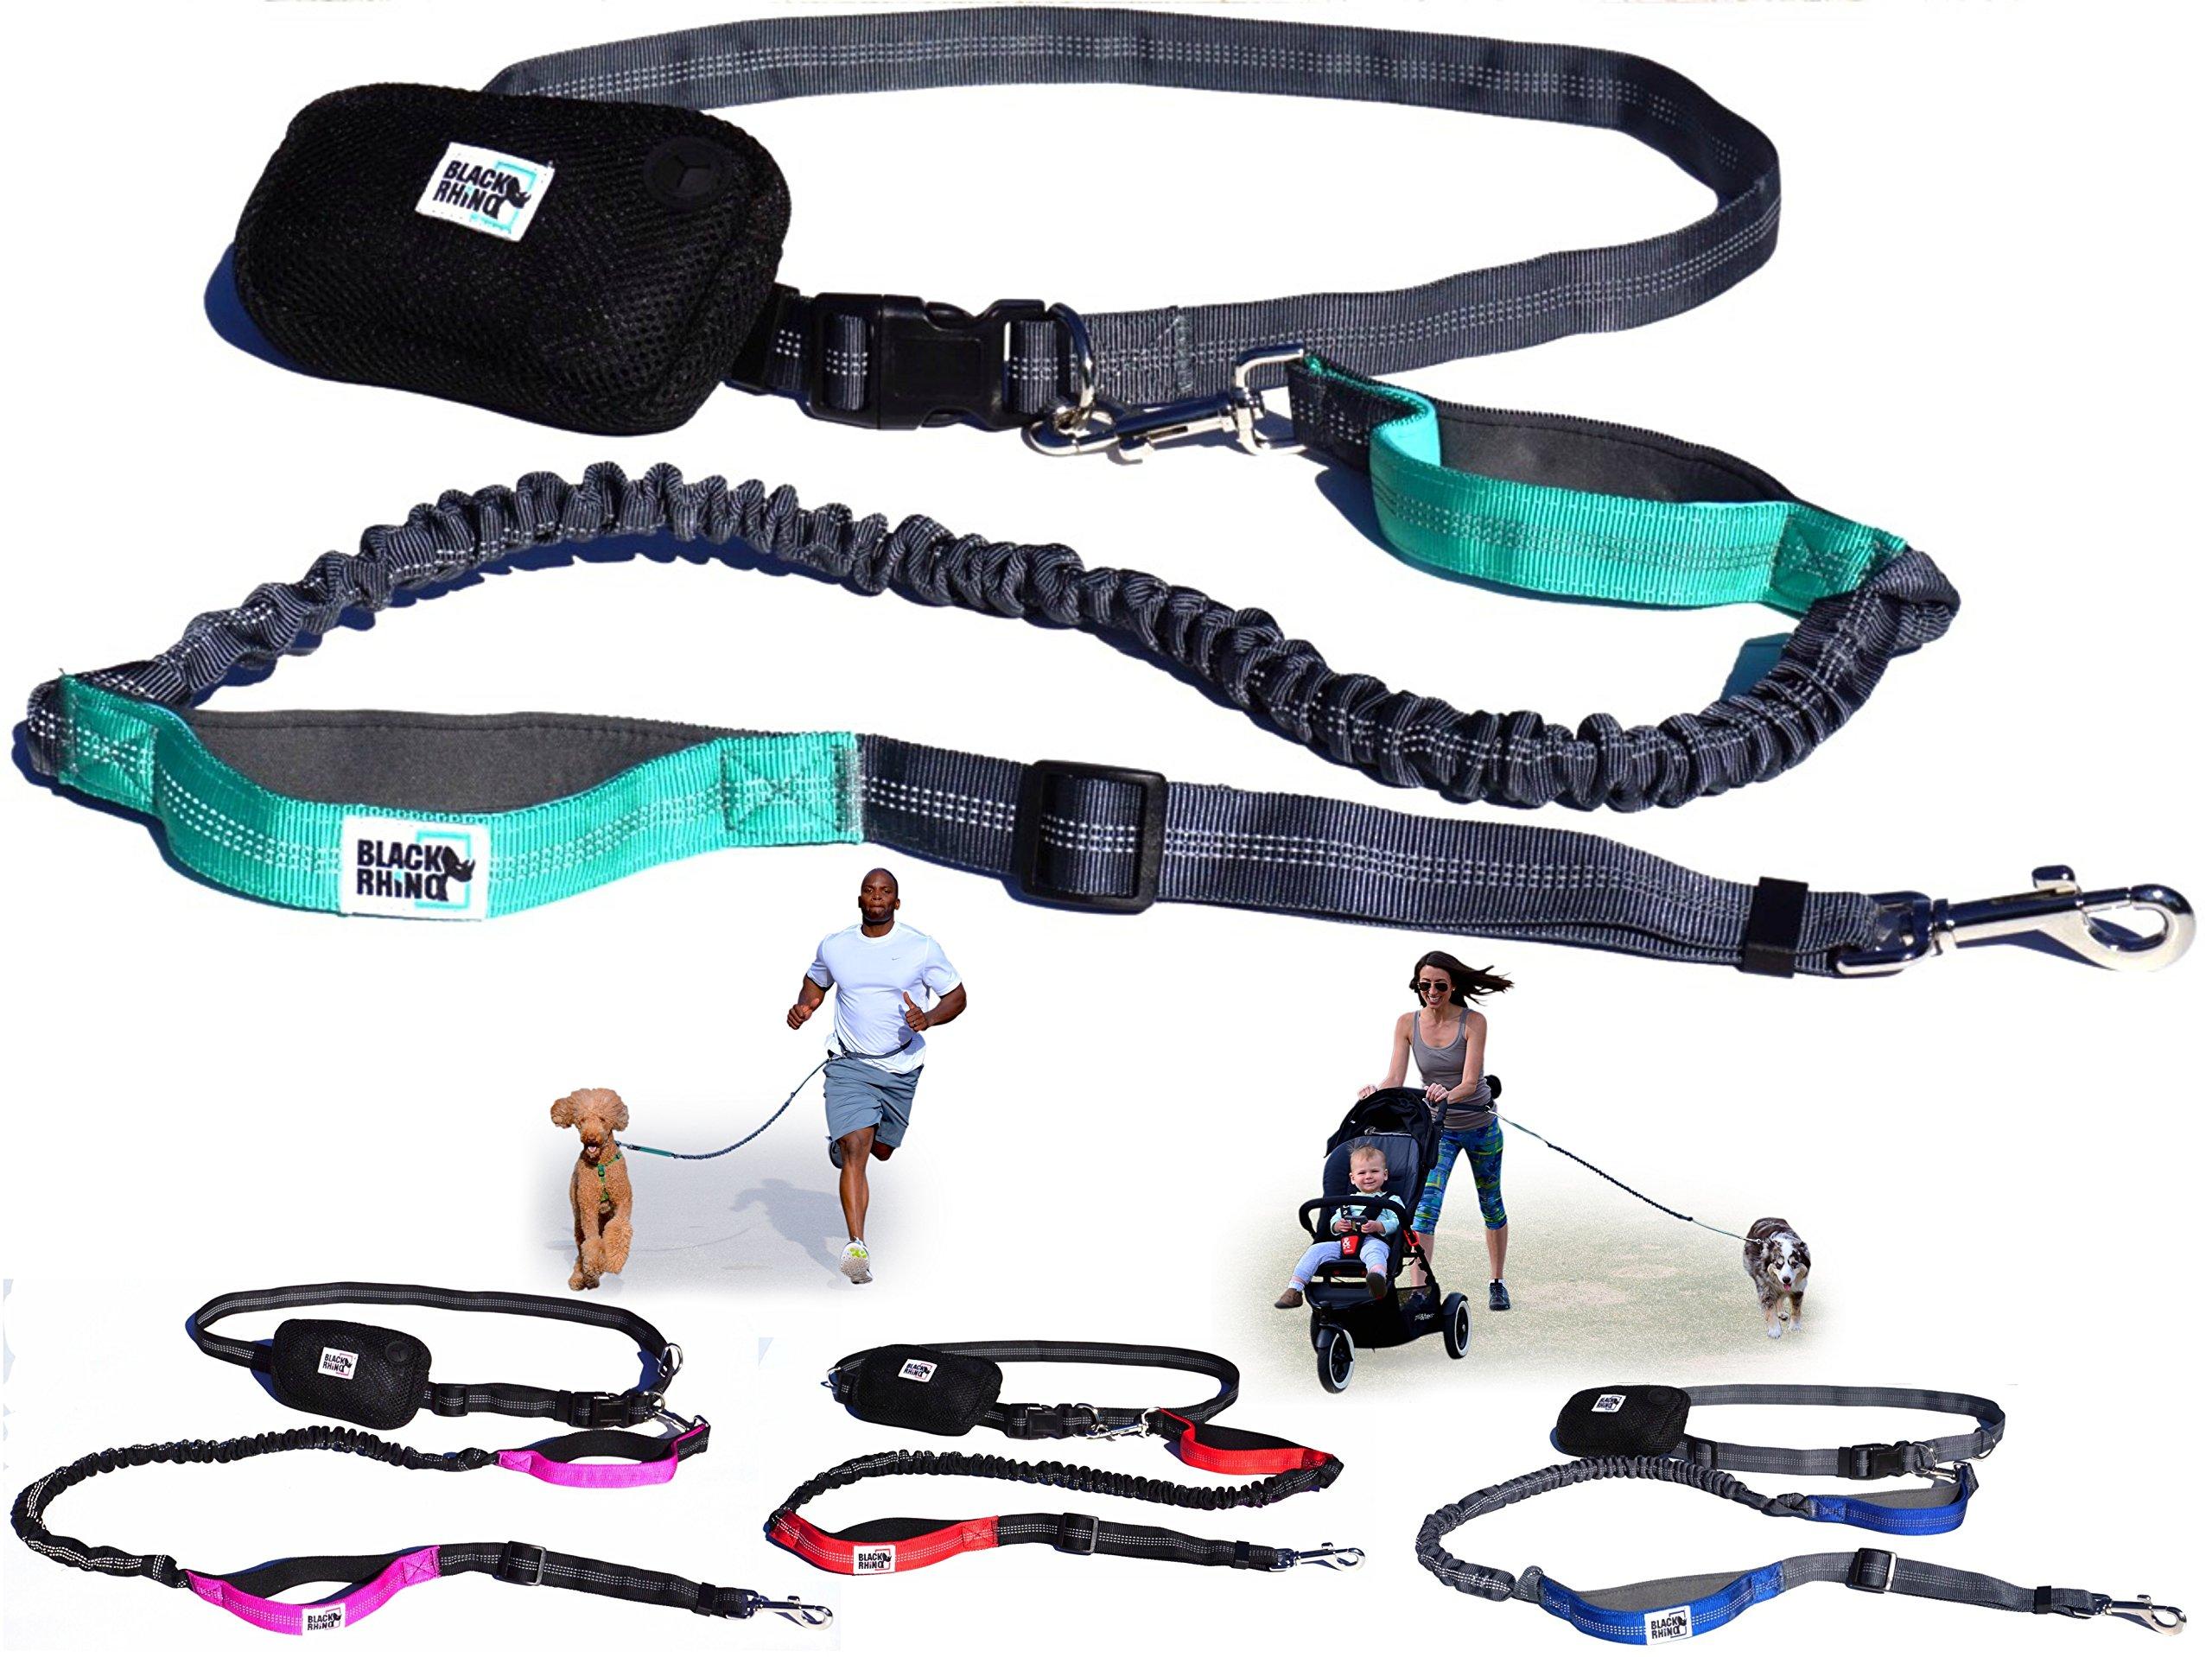 Black Rhino Premium HANDS FREE DOG LEASH for Running Walking Jogging & Hiking - Adjustable Length Dual Handle Bungee Leash Medium – Large Dogs Neoprene Padded Handles - Running Pouch Included Aqua